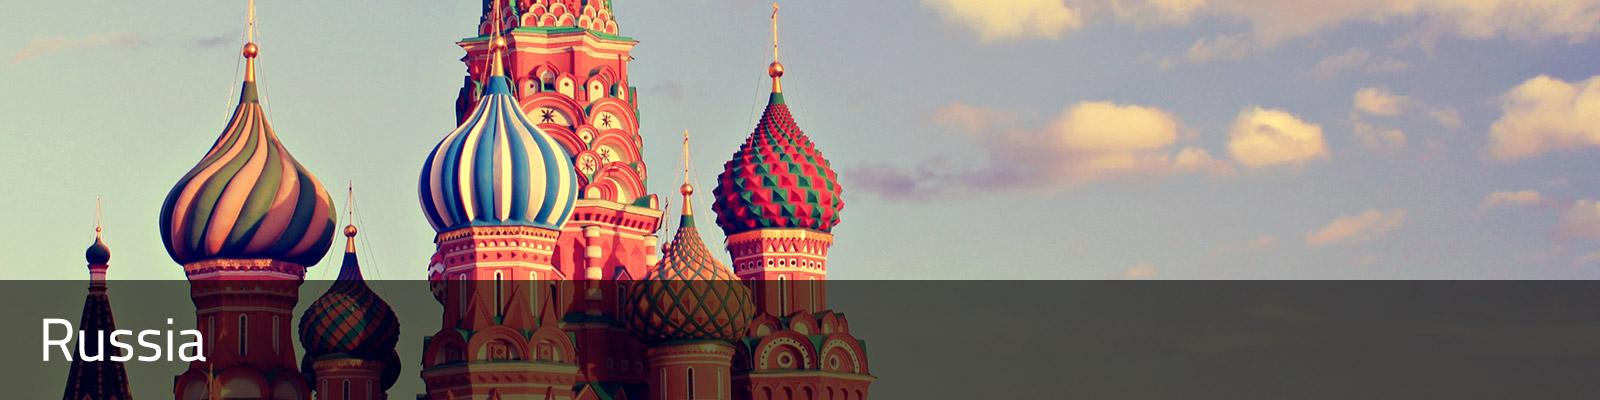 casino recruitment russia